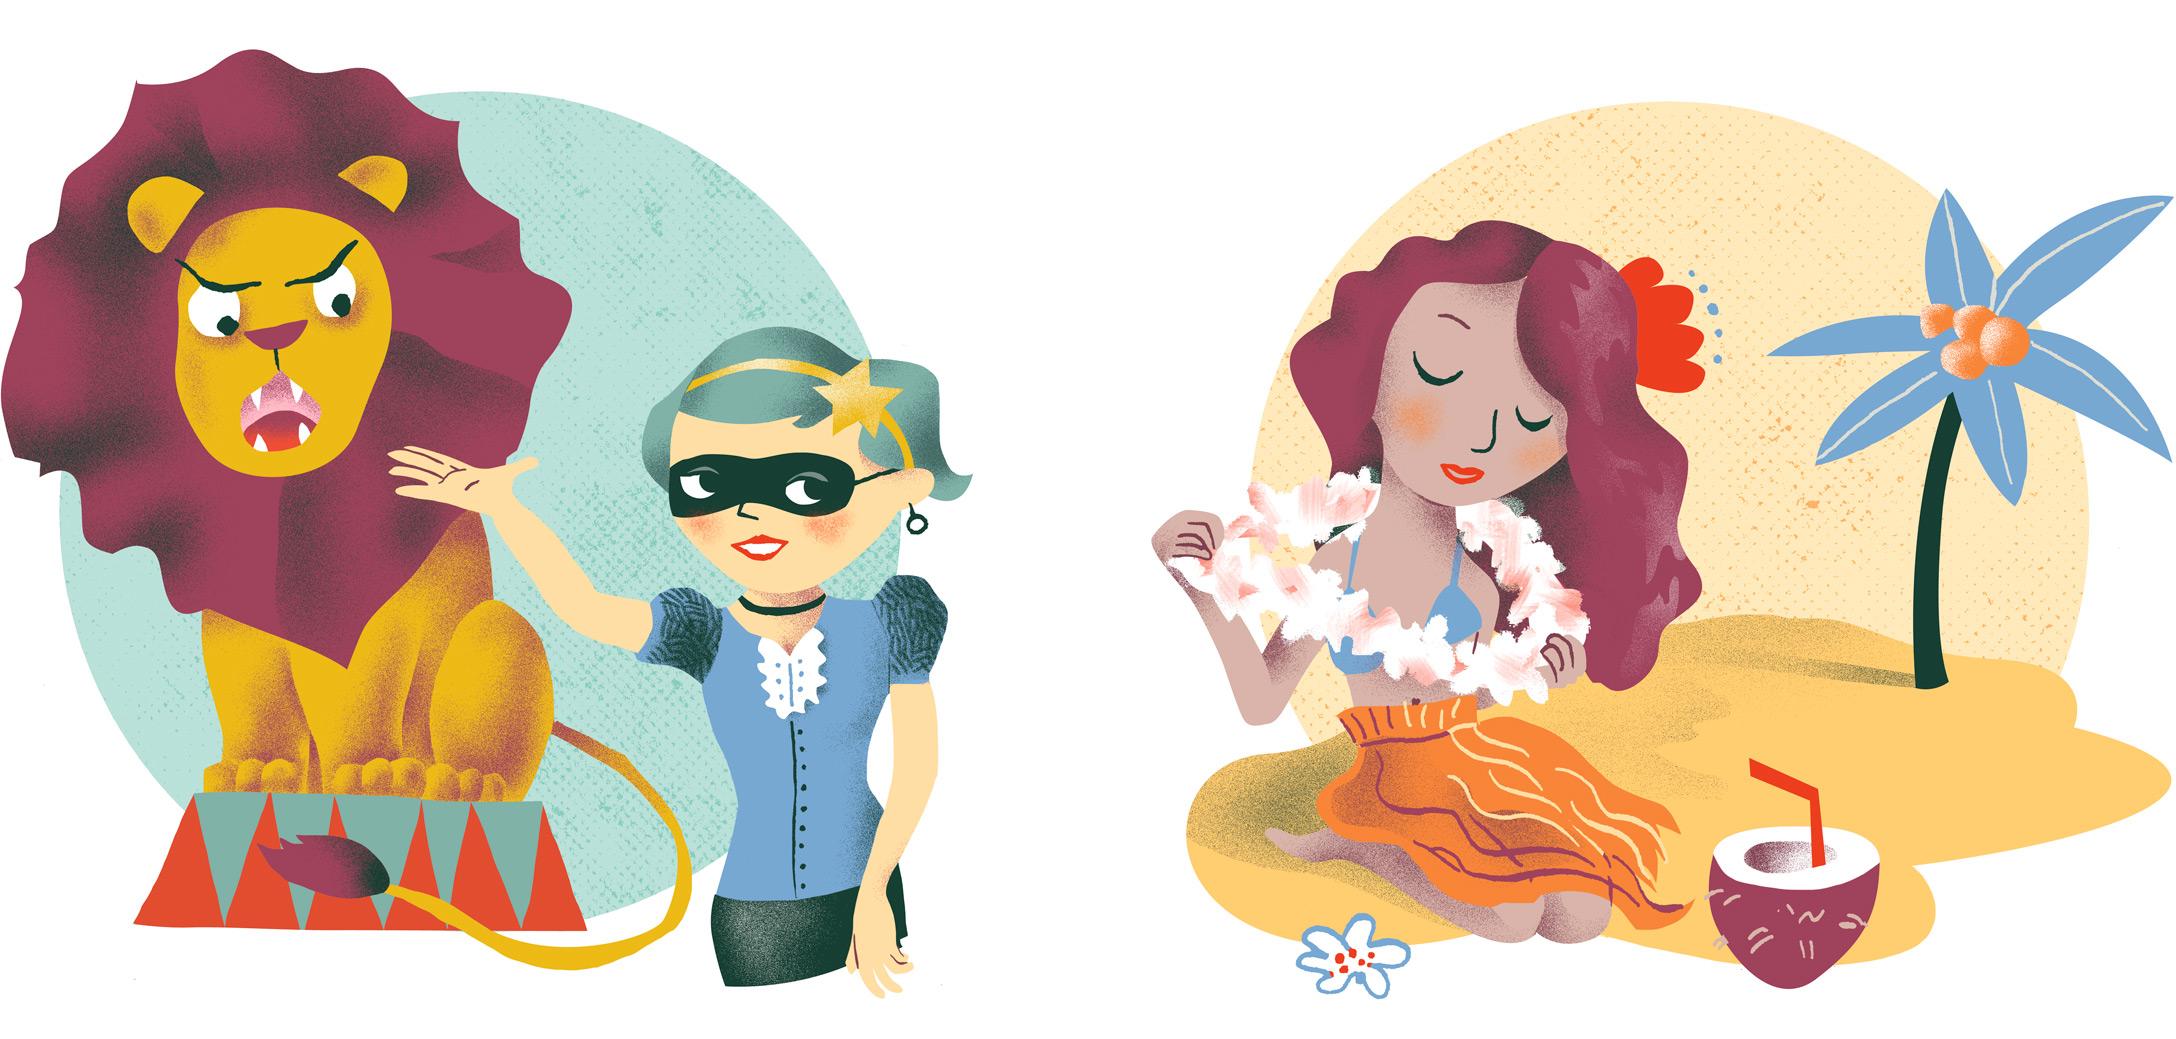 Annalisa Papagna illustration - Horoscope: Leo and Virgo